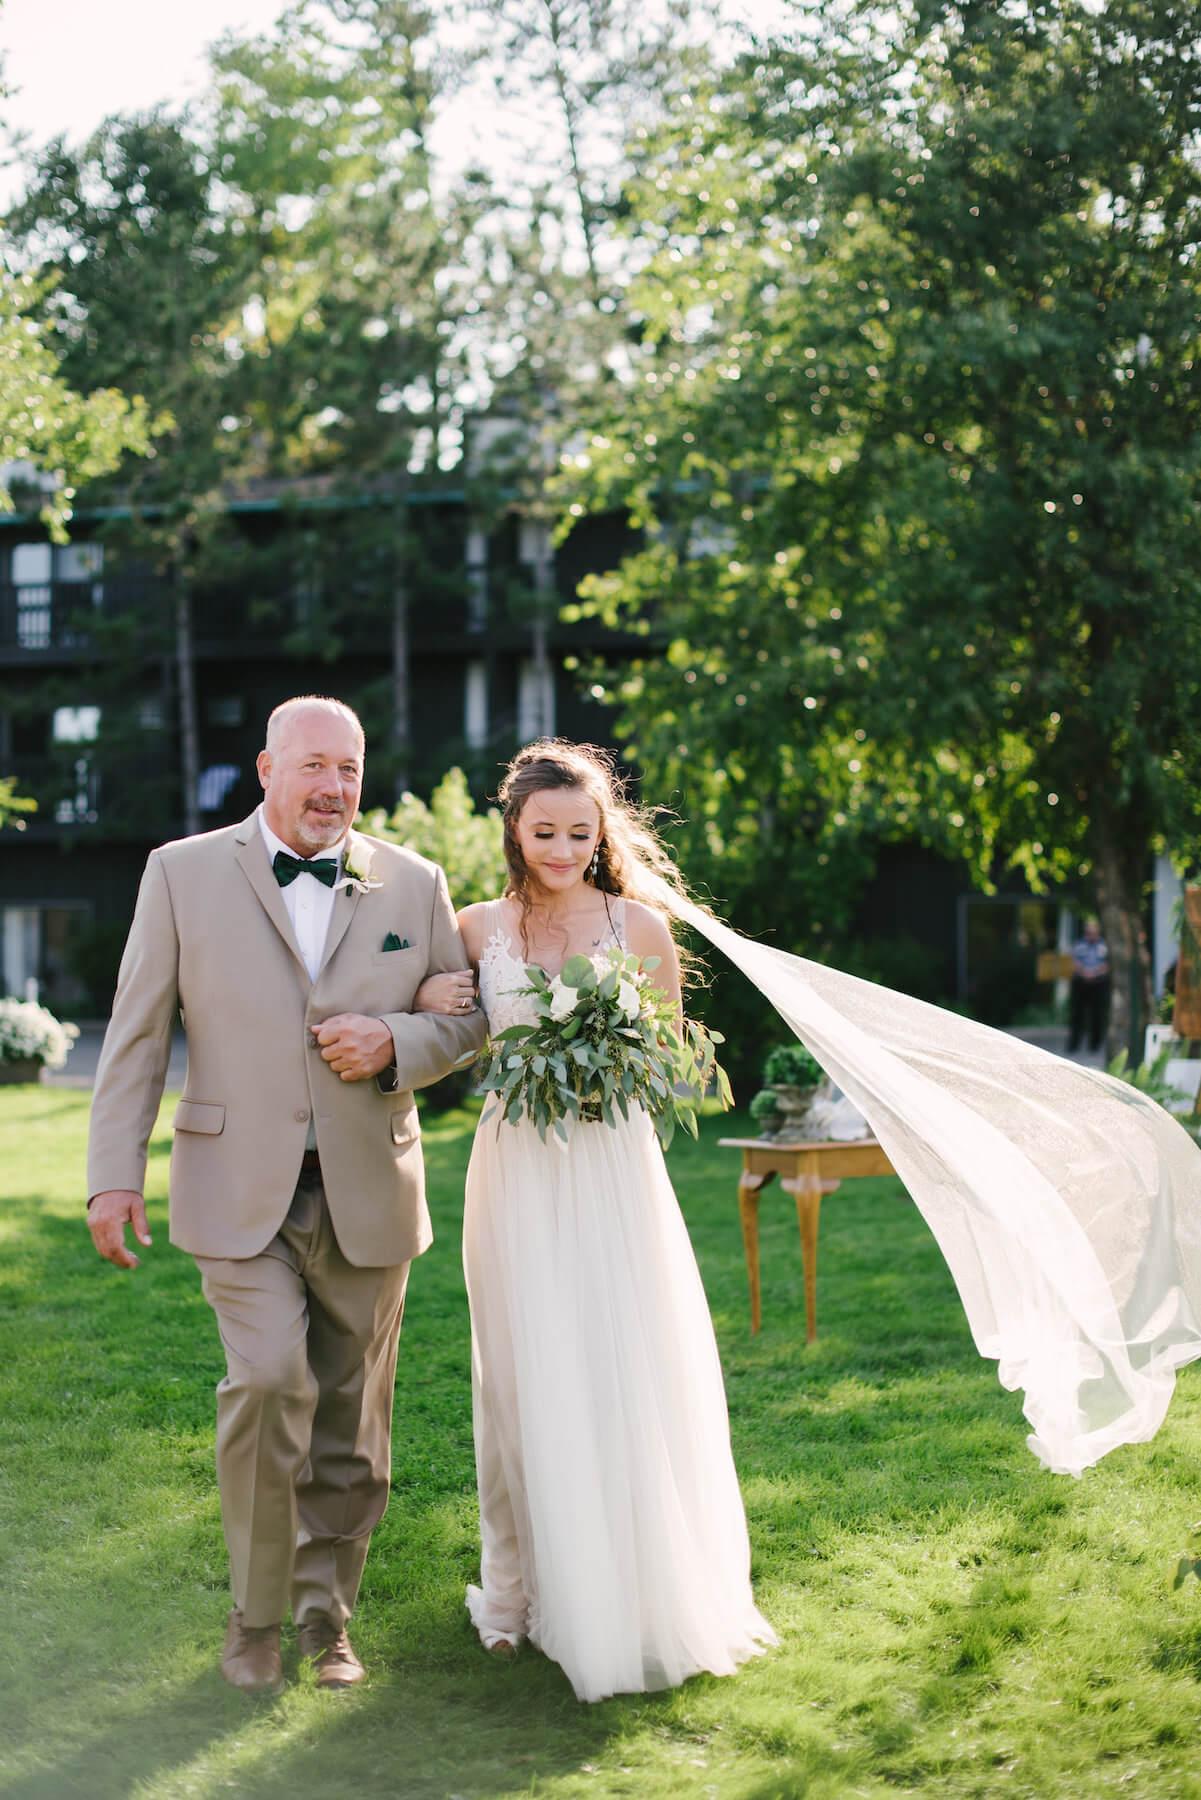 engle-olson-wedding-blair-taylor-28.jpg